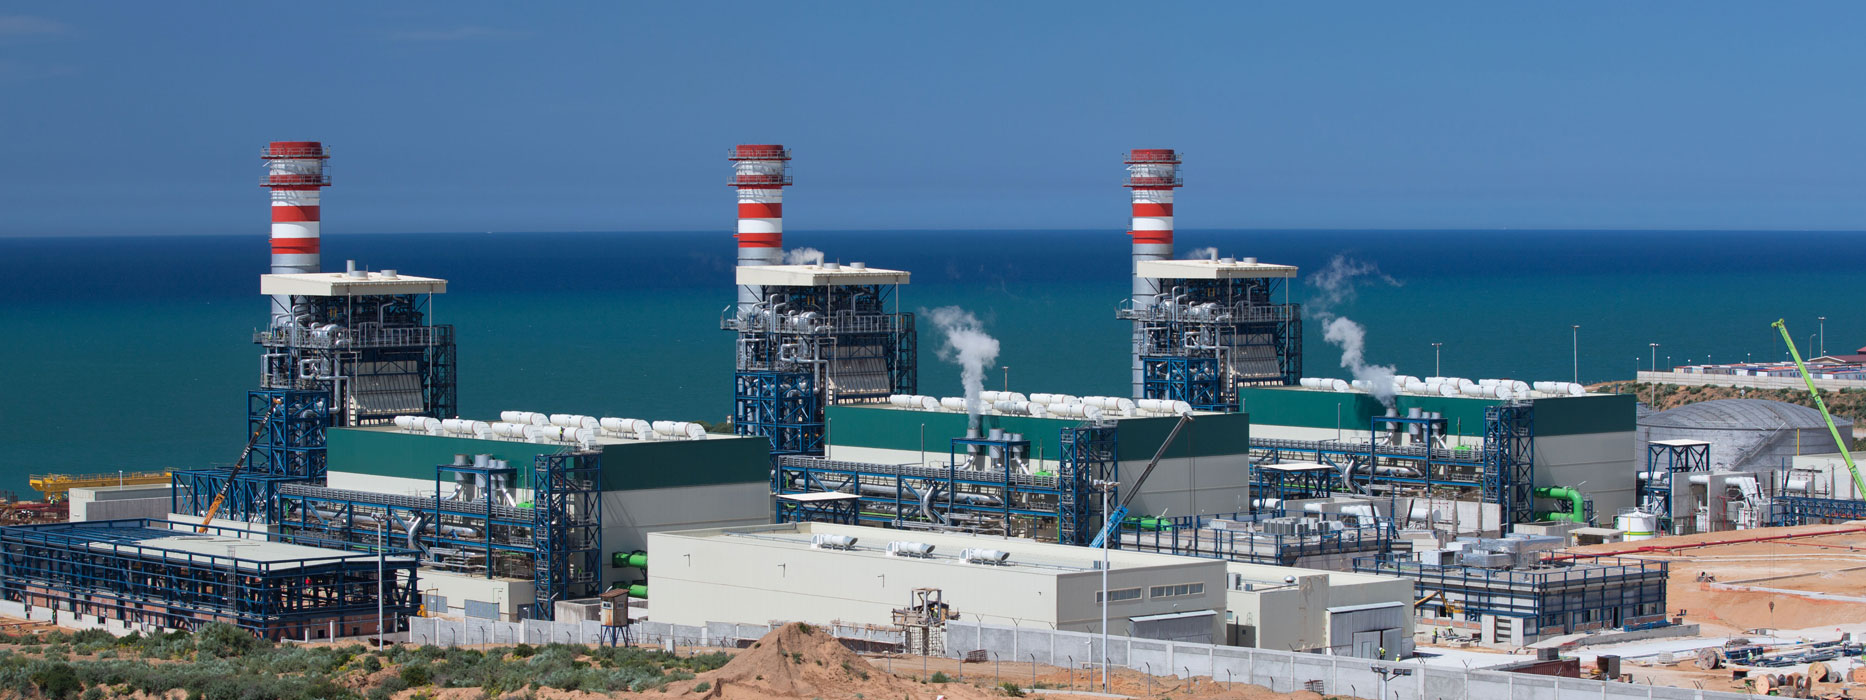 Ciclo Combinado Koudiet 1200 MW